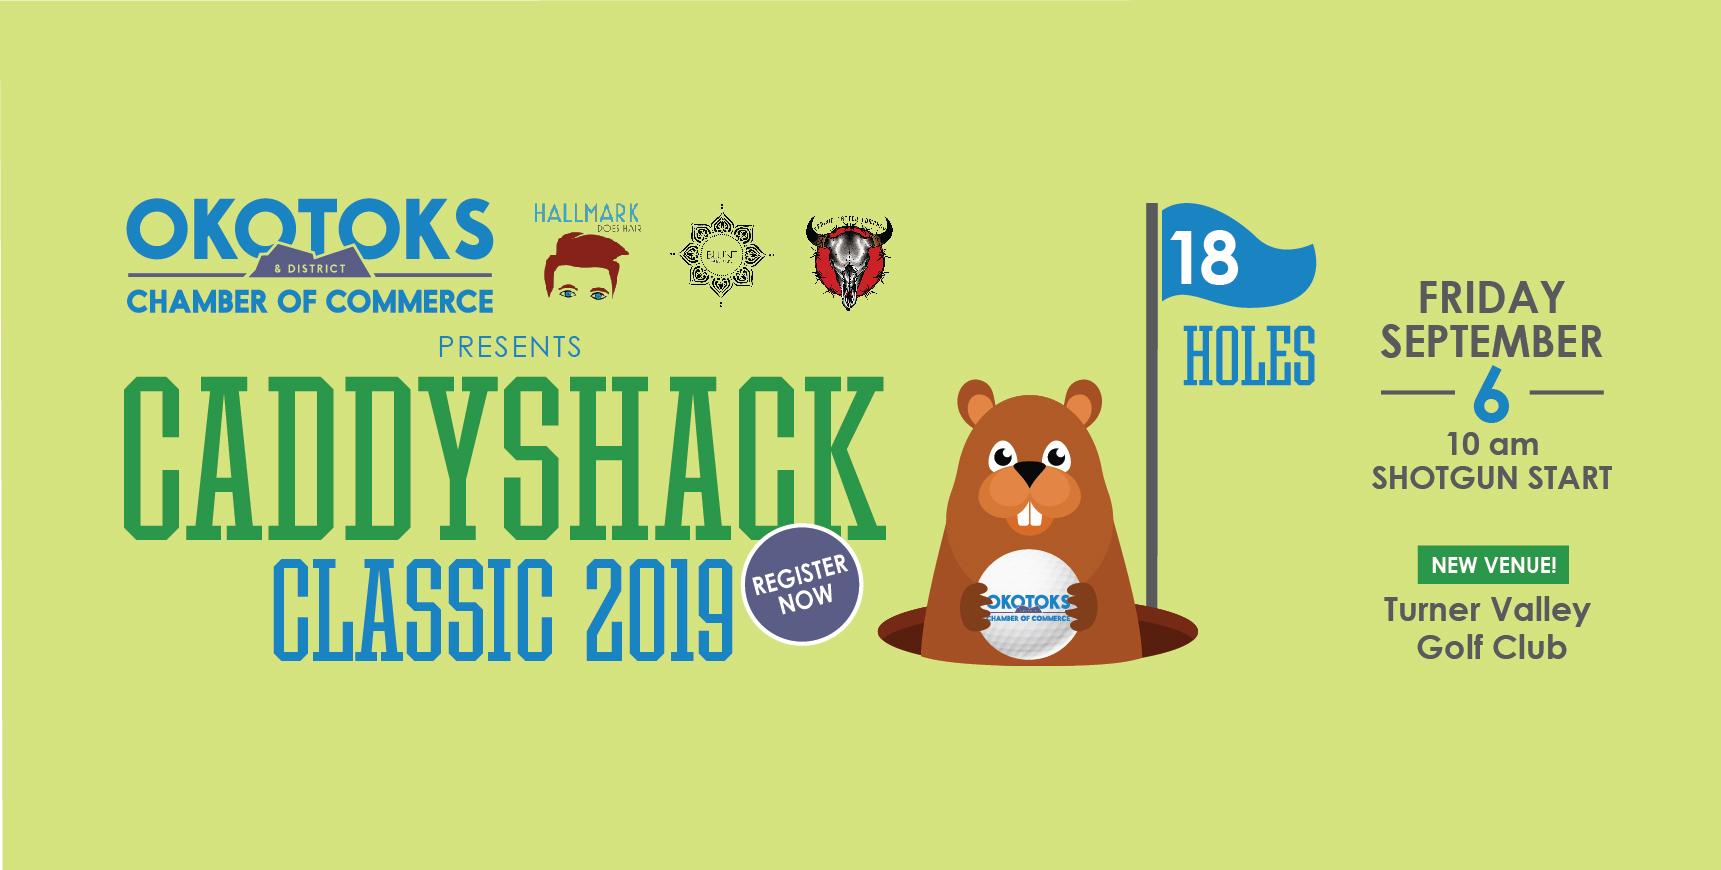 caddyshack-banner.jpg